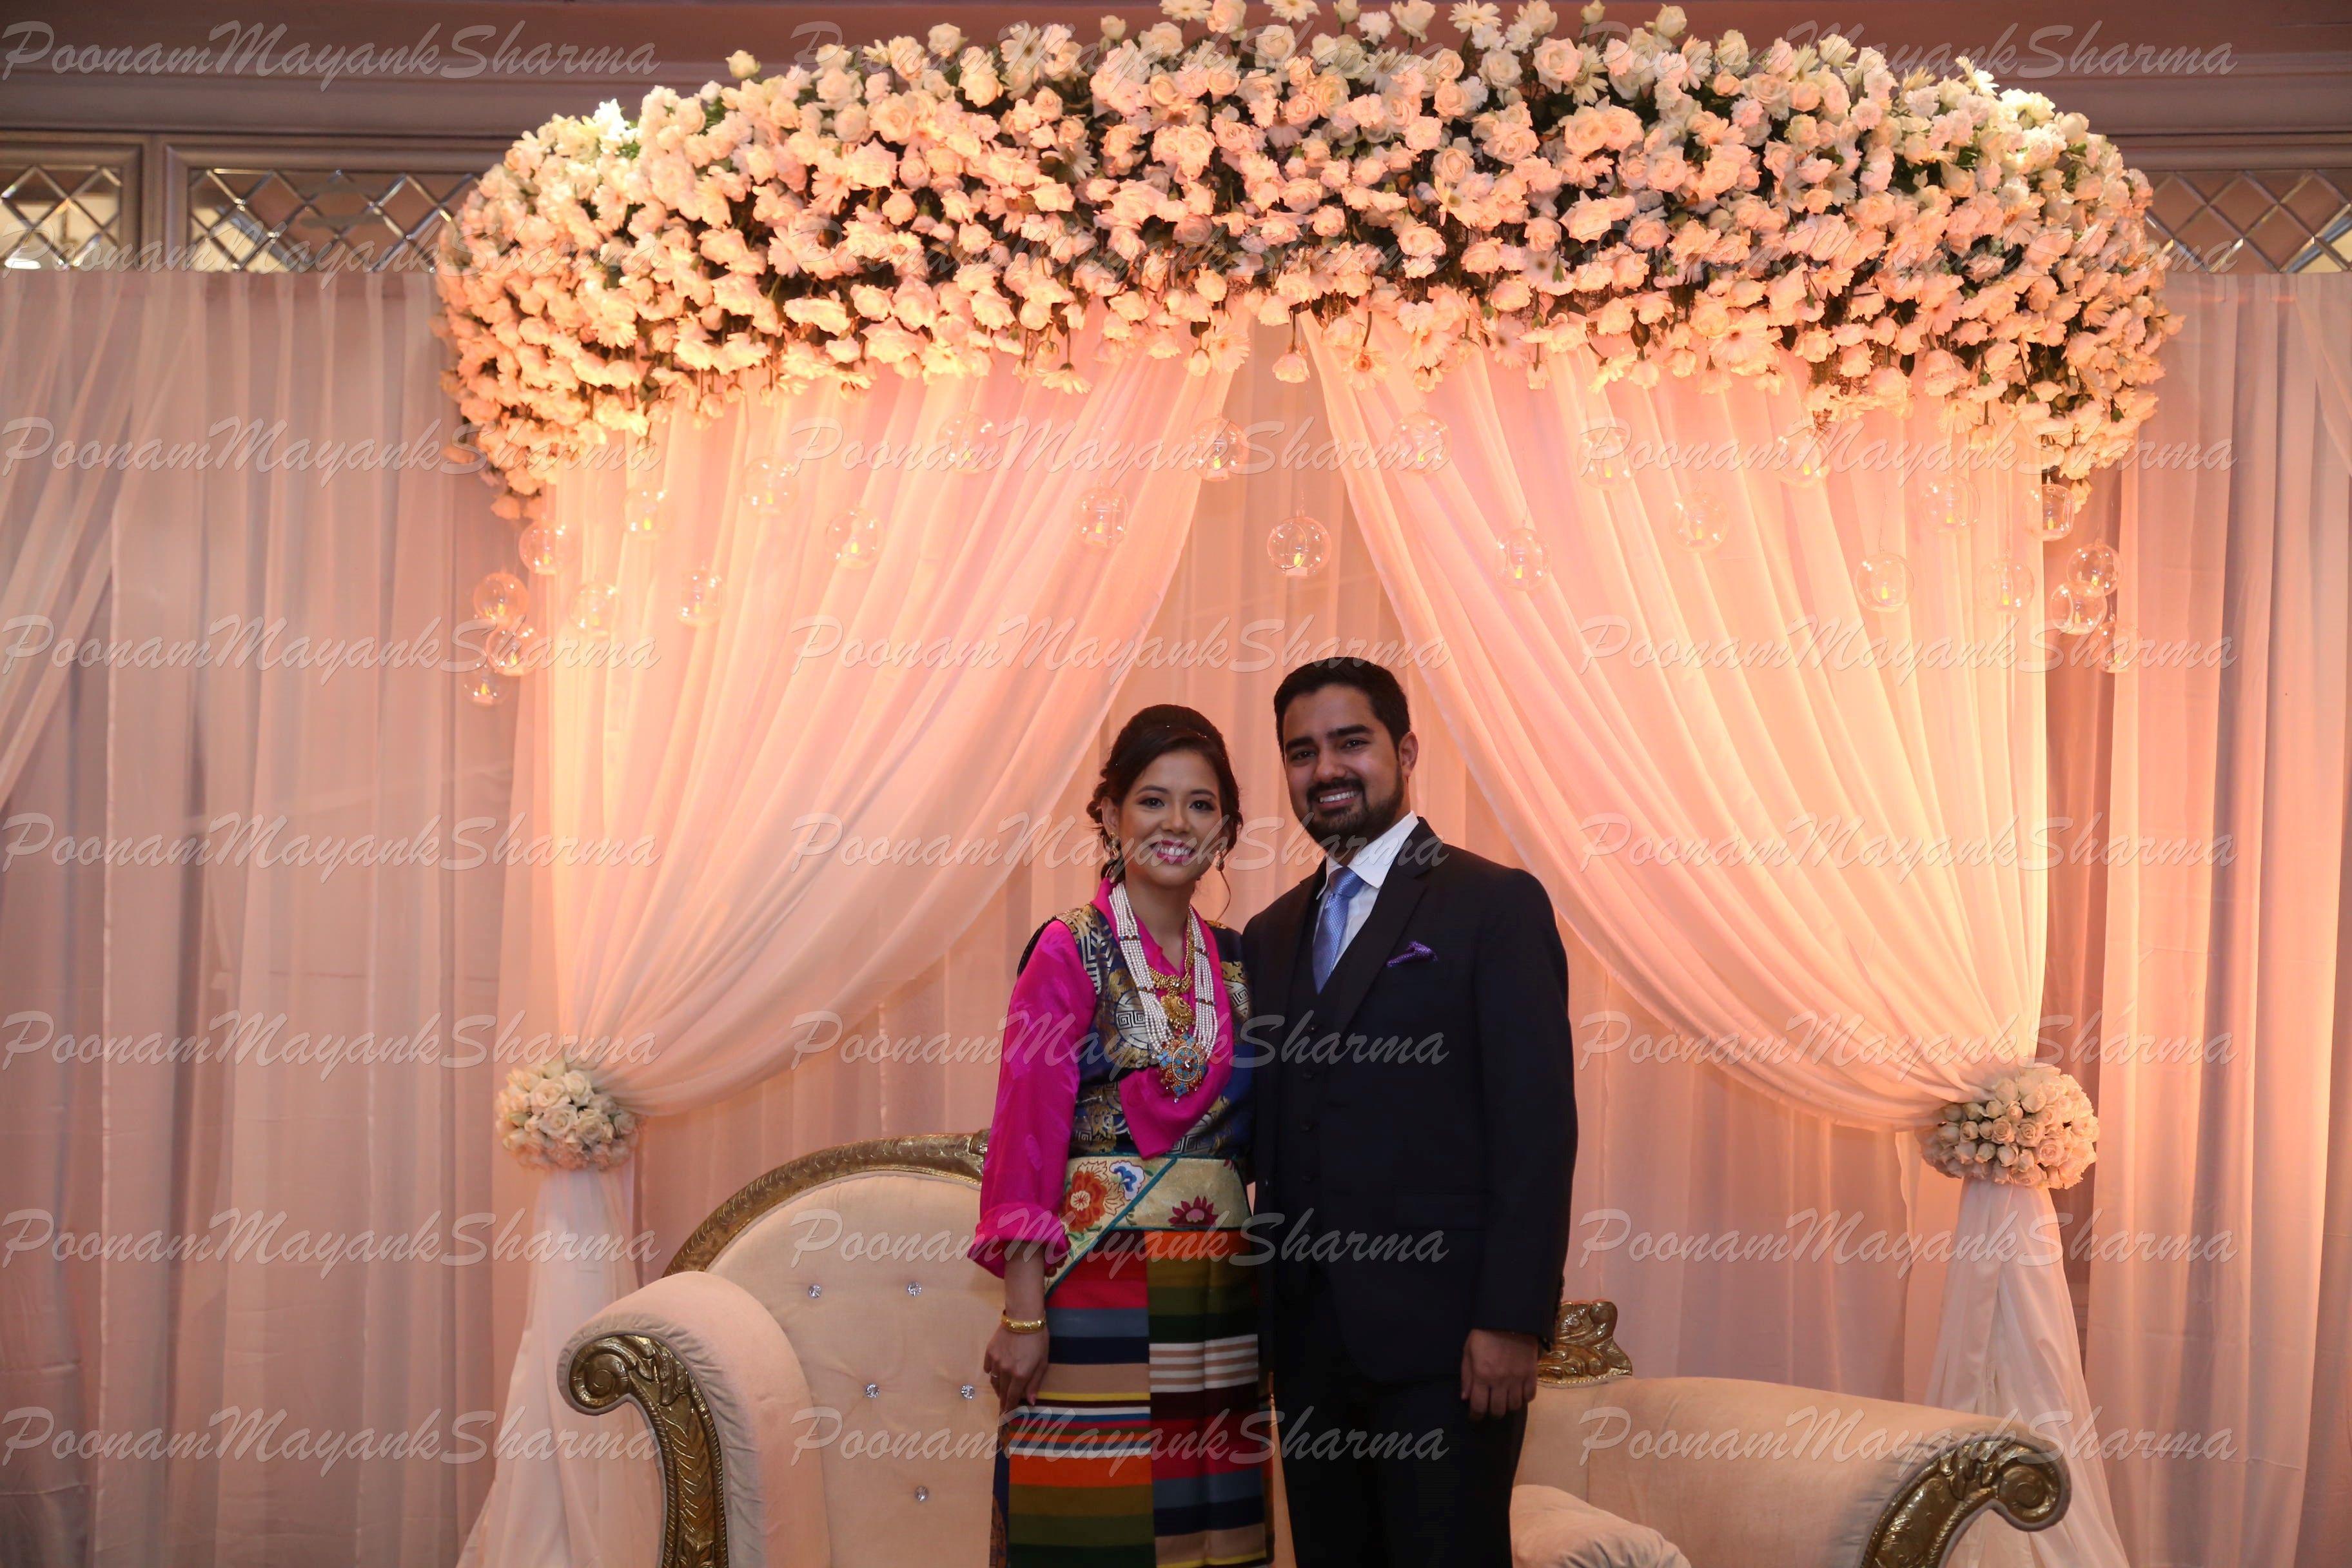 Wedding decorations for reception december 2018 Jasmeen Ghai jasmeenghai on Pinterest